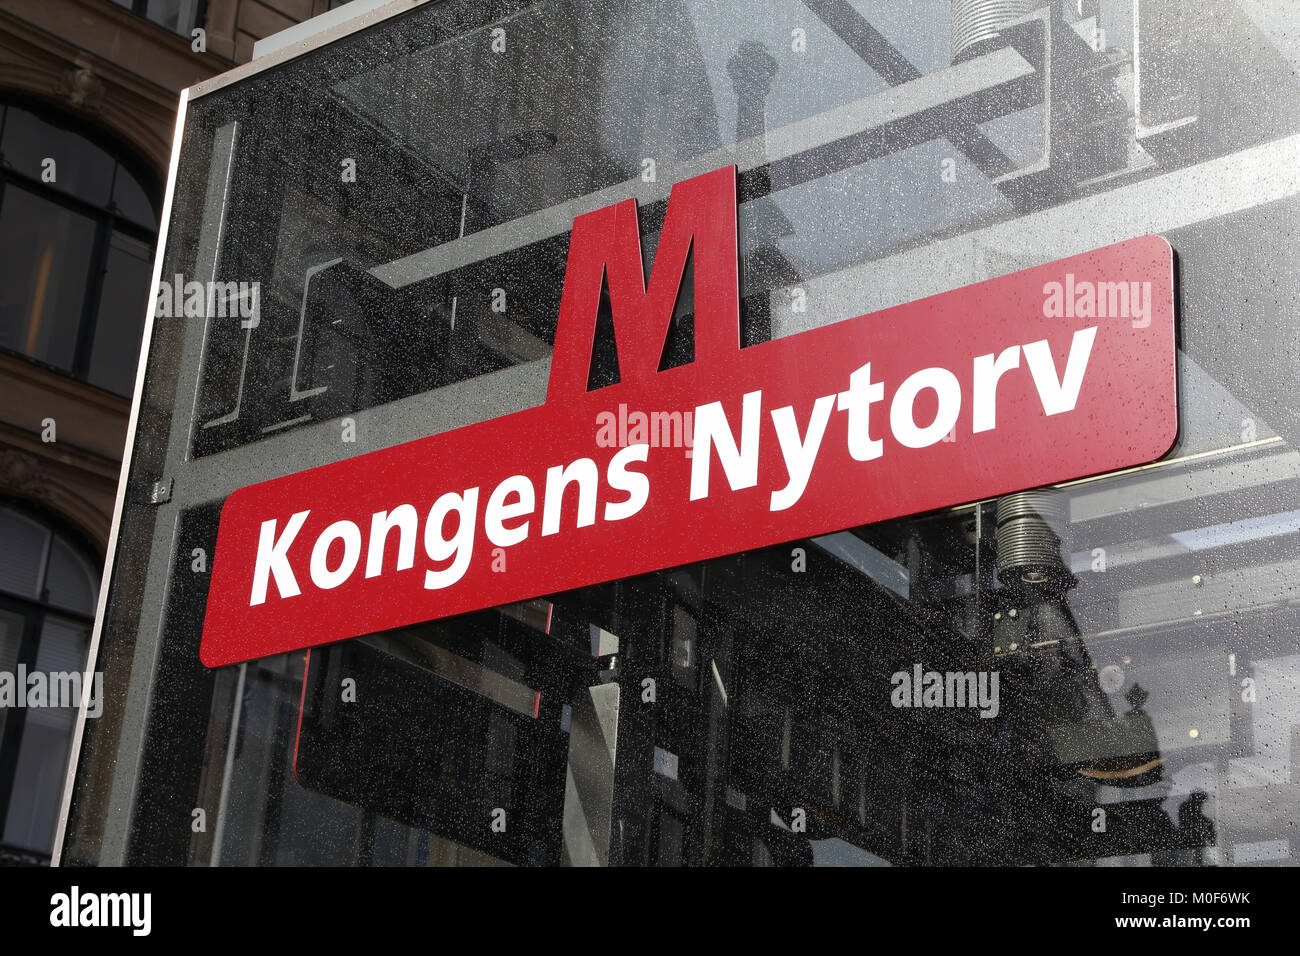 COPENHAGEN - MARCH 11: Kongens Nytorv metro station on March 11, 2011 in Copenhagen, Denmark. It is a popular mode - Stock Image